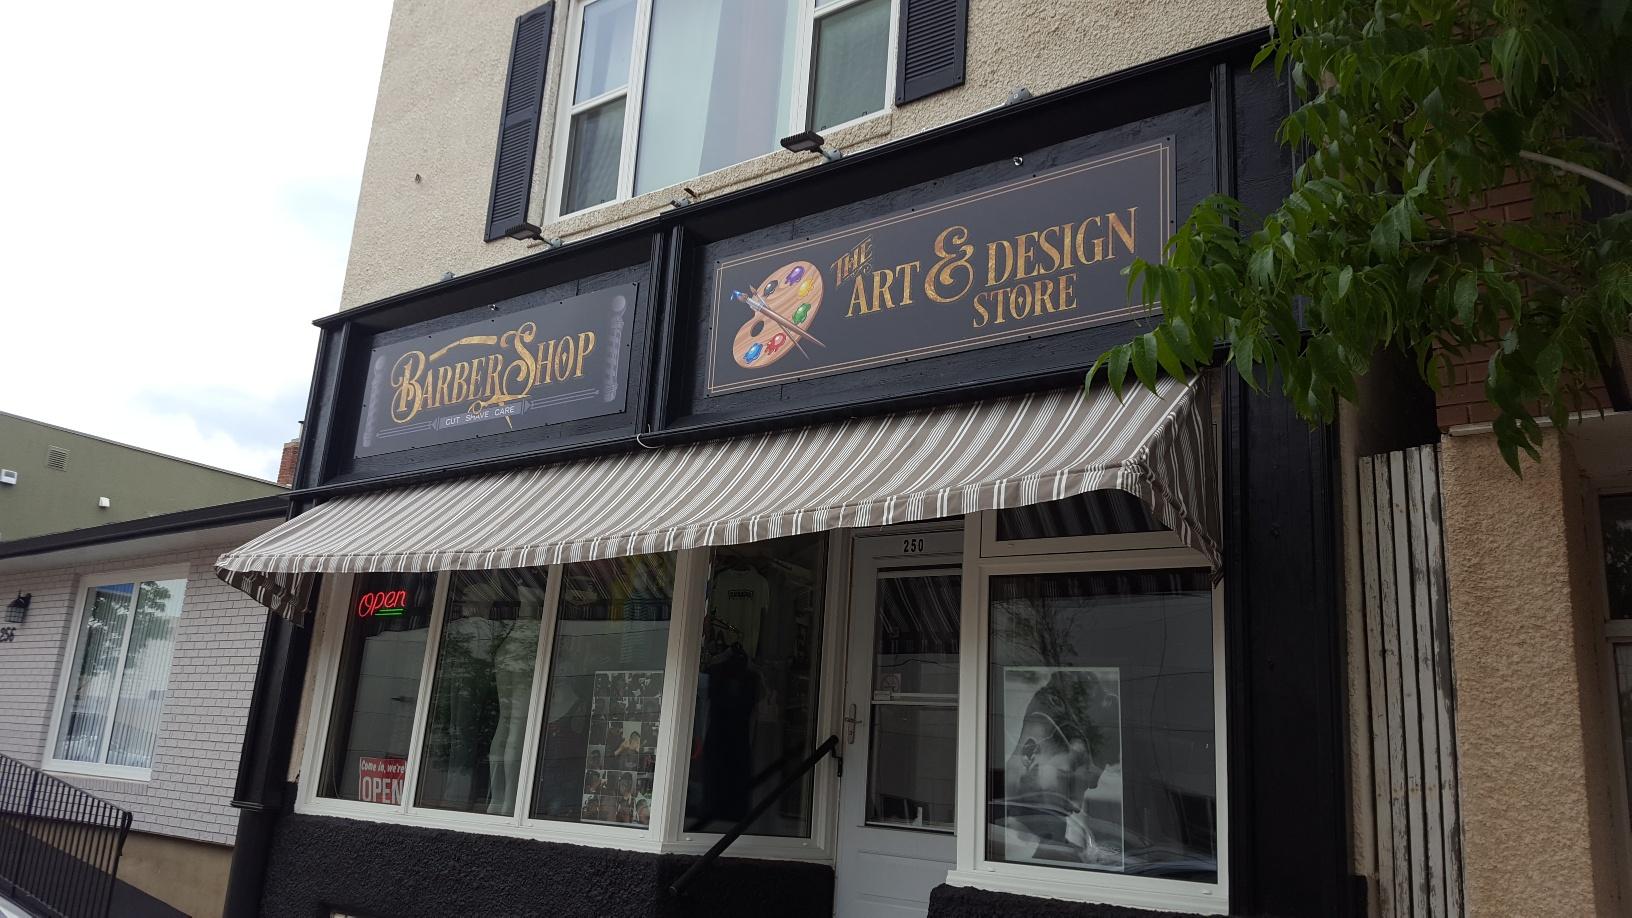 Barber Shop Art Store